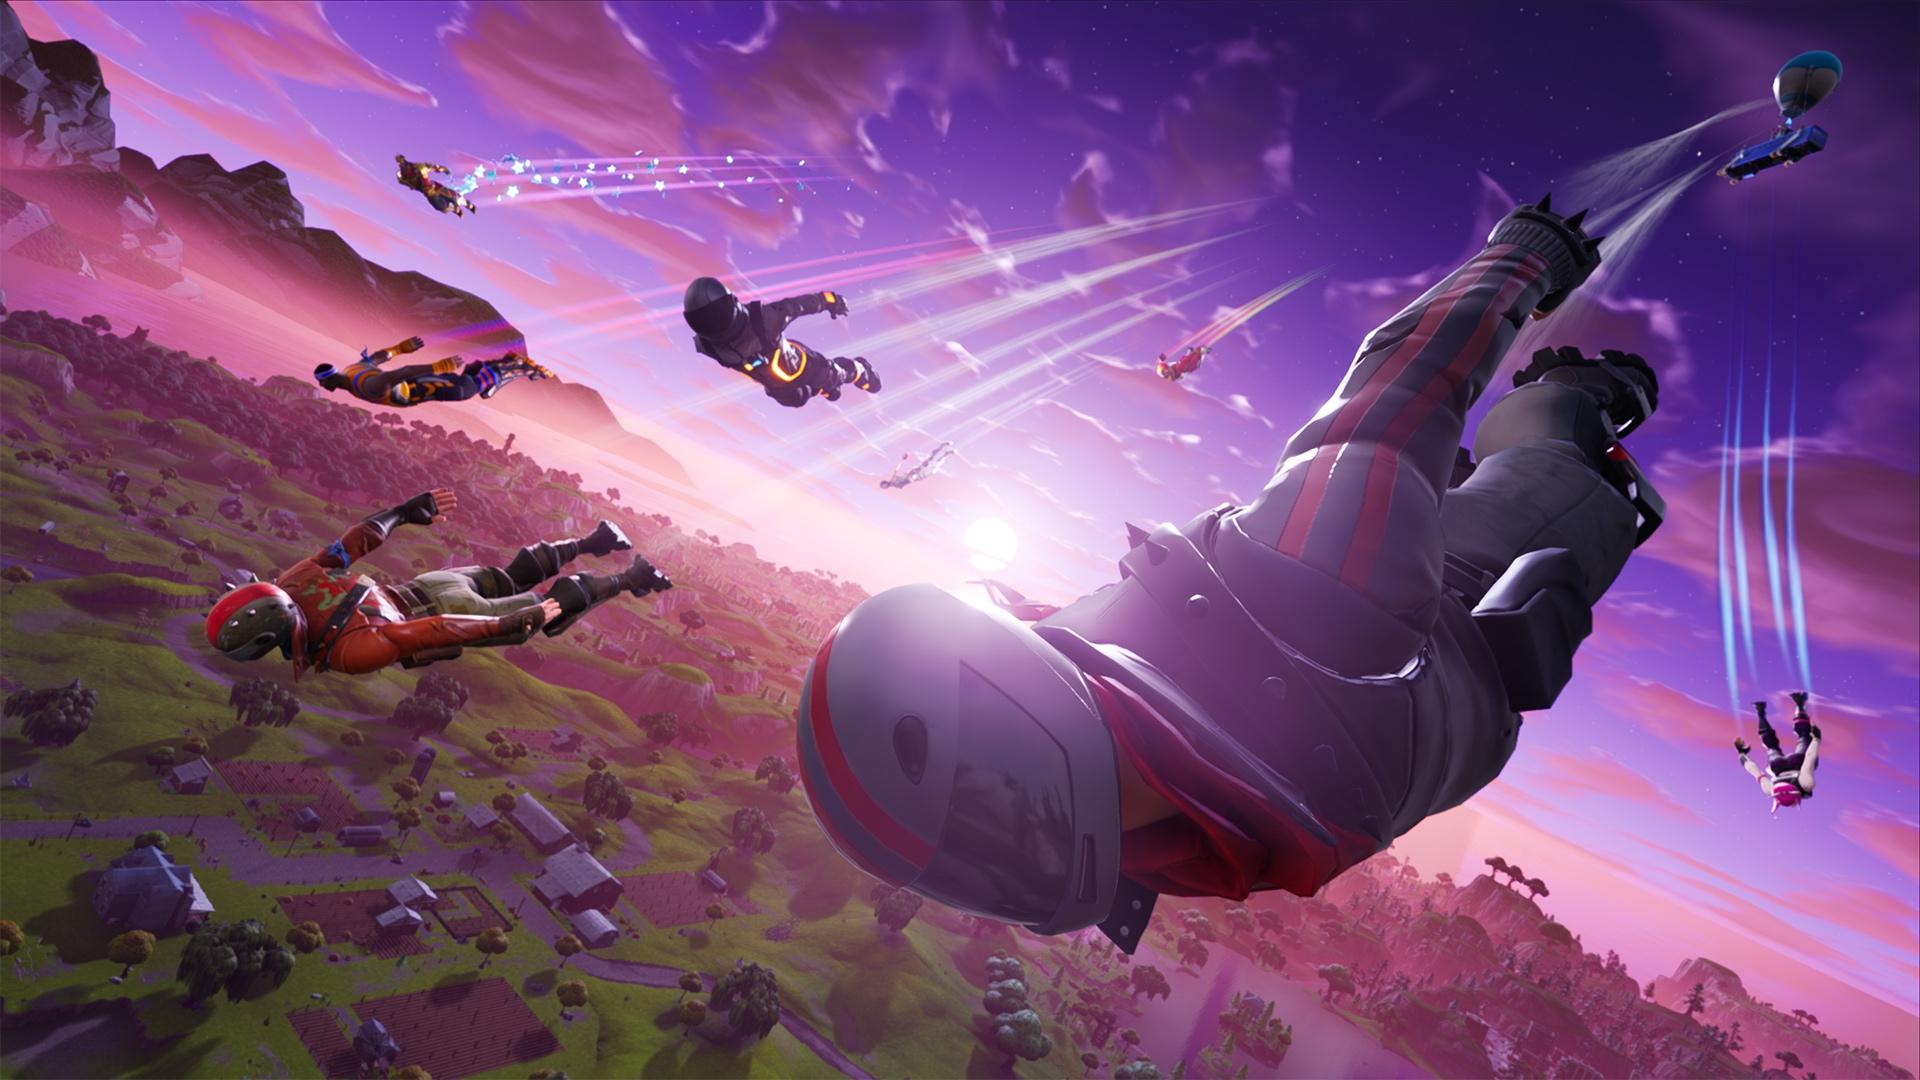 PUBG maker drops suit against Epic Games over Fortnite - Polygon